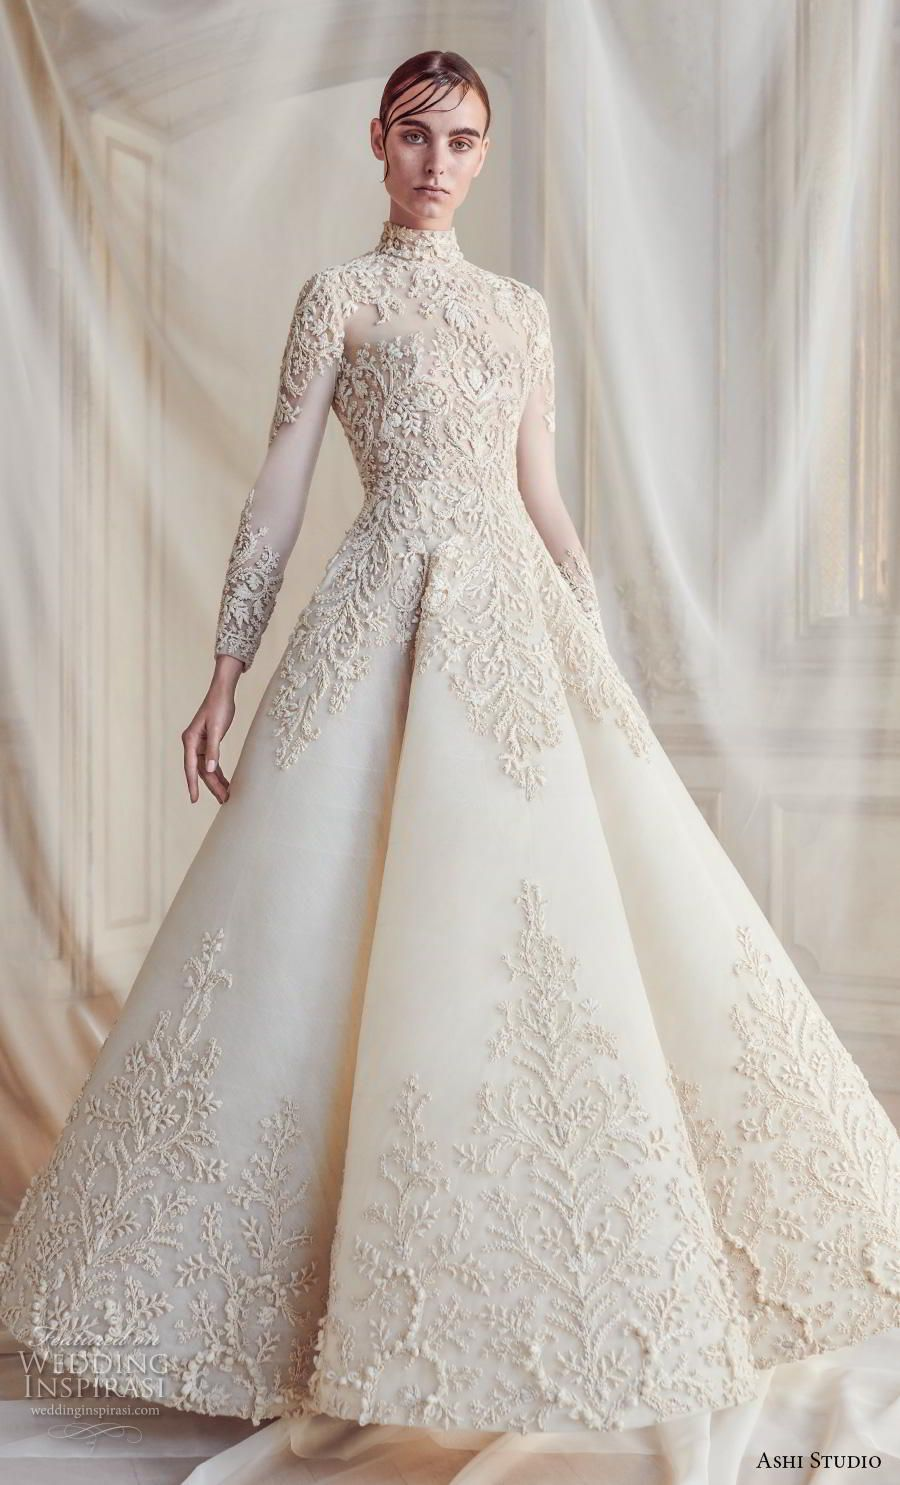 Ashi Studio Fall Winter 2018 2019 Couture Collection Wedding Inspirasi Modest Wedding Dresses Beautiful Dresses Ball Gown Wedding Dress [ 1485 x 900 Pixel ]